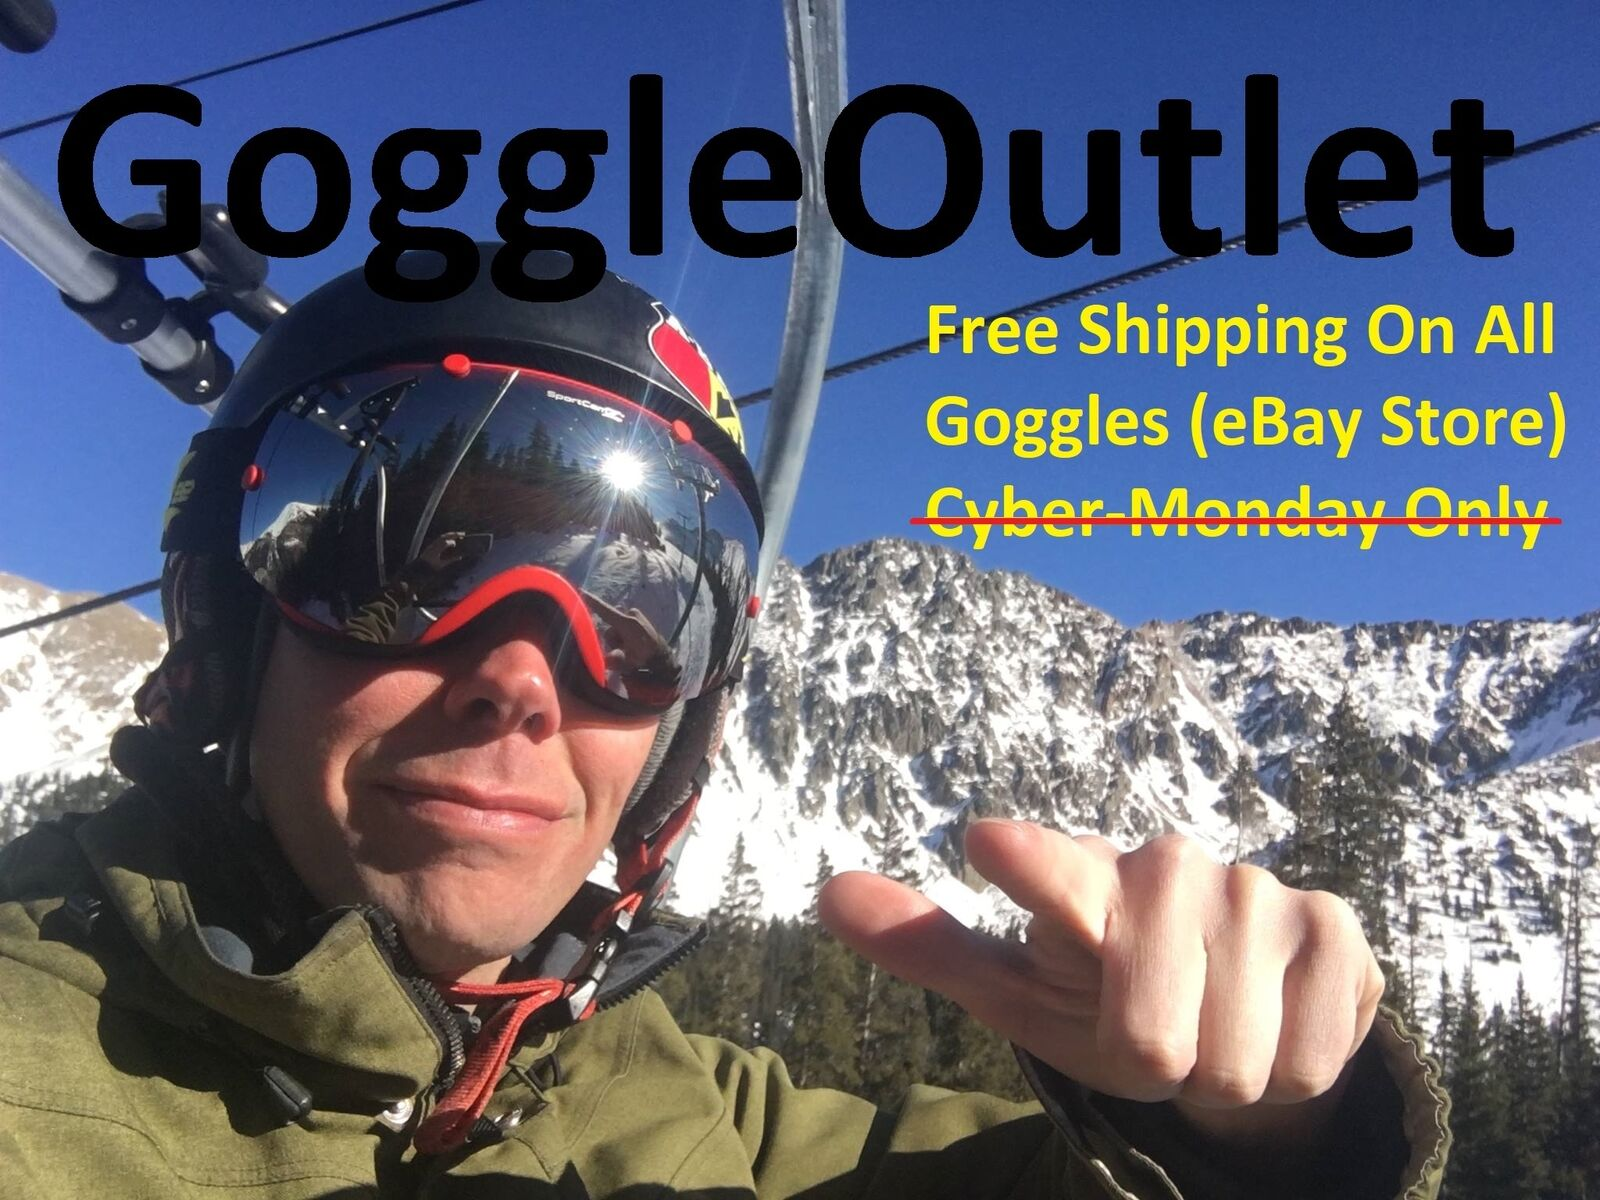 GoggleOutlet